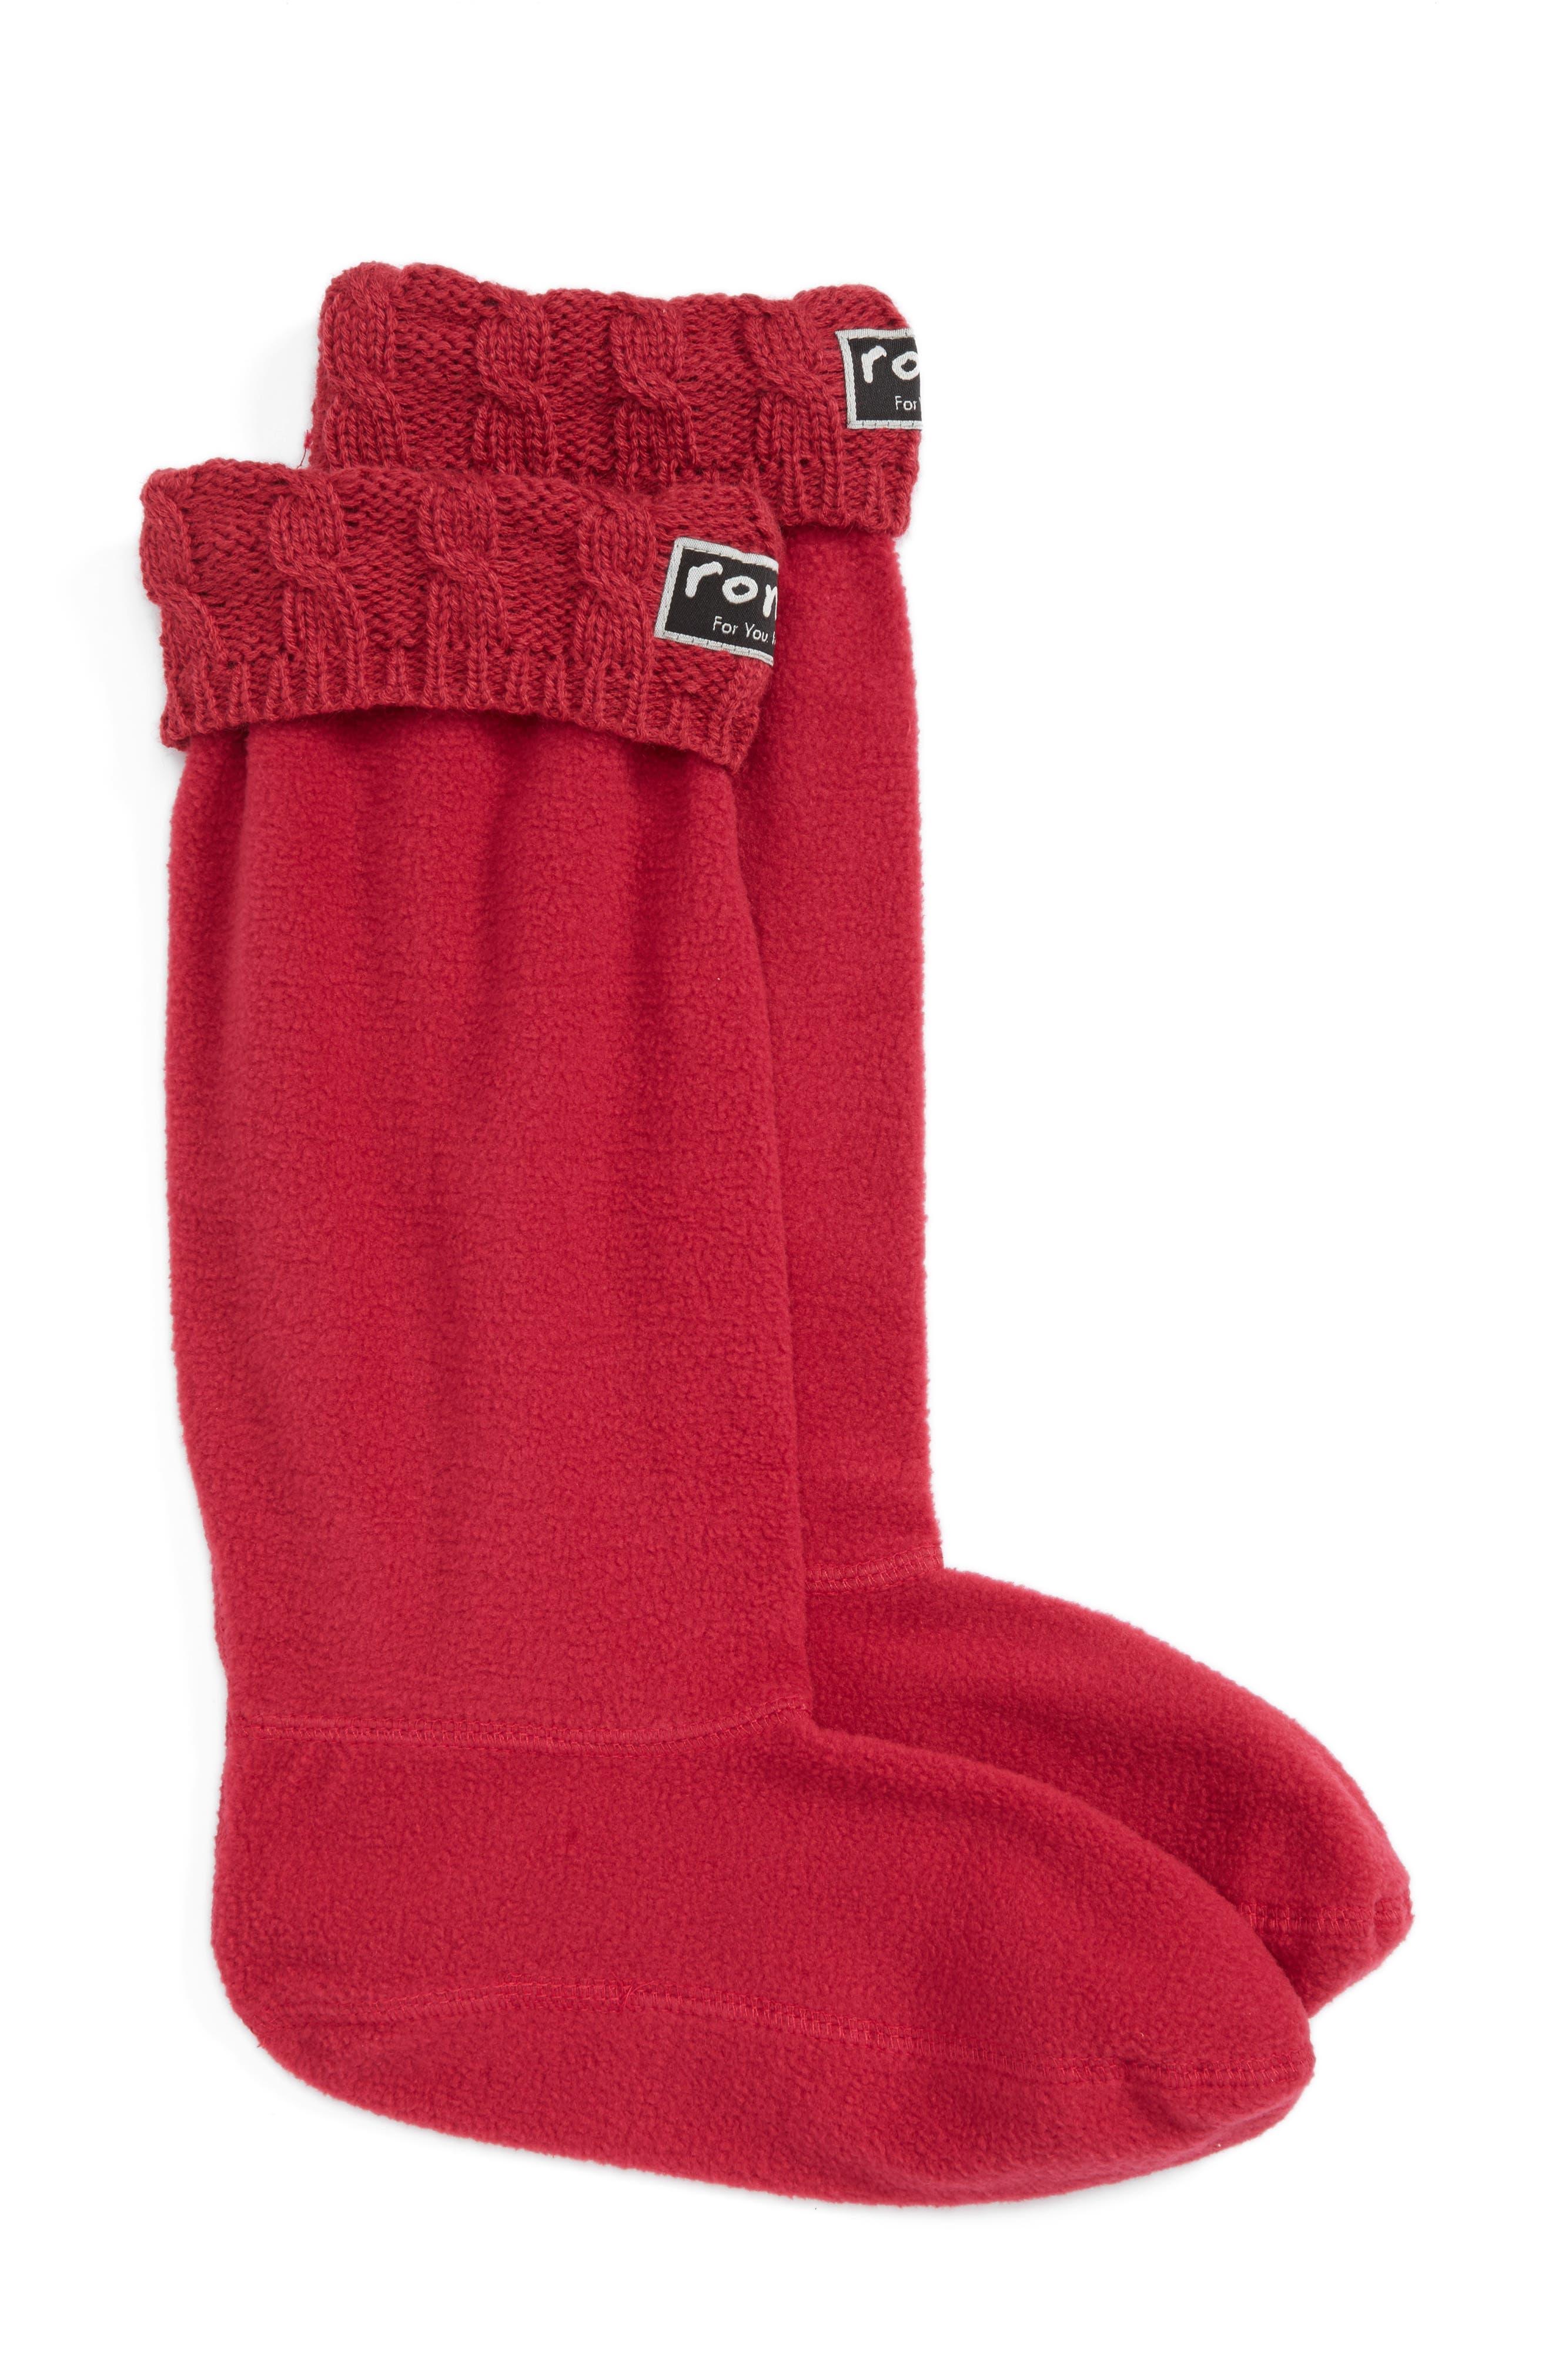 Main Image - roma Knit Collar Fleece Boot Socks (Women)